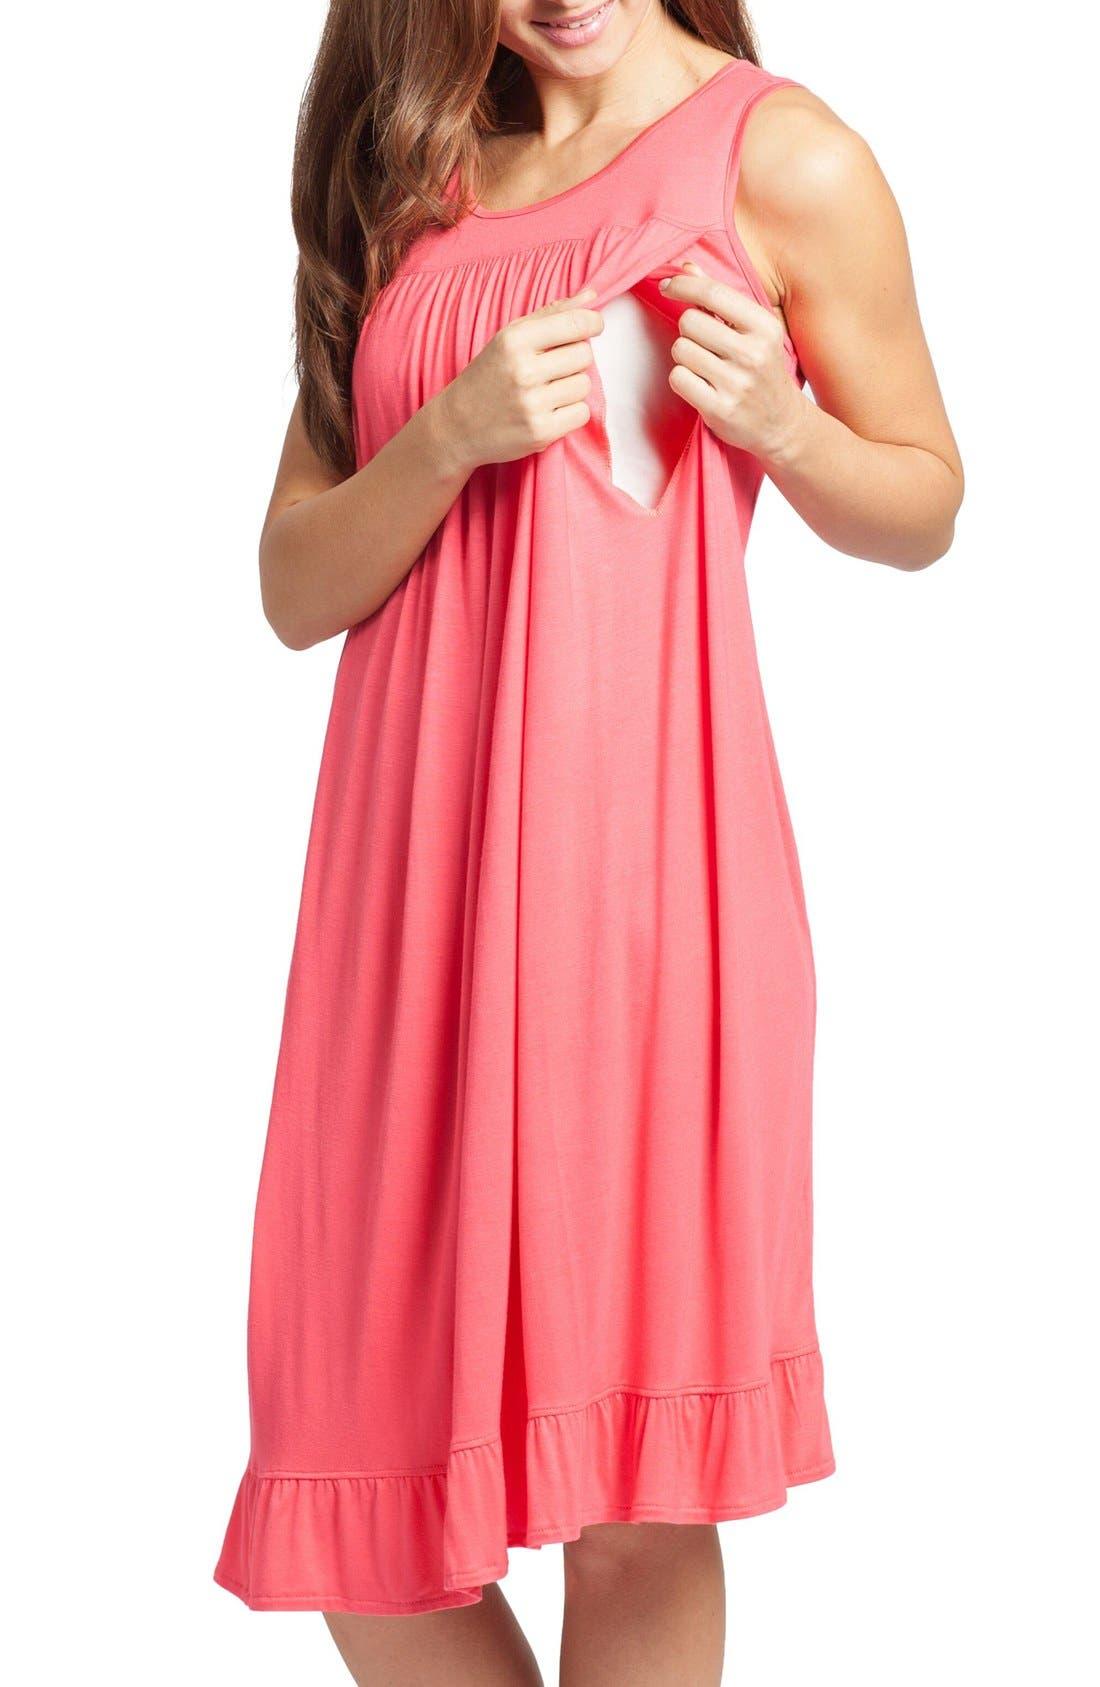 Alternate Image 3  - Savi Mom 'The Ruffled' Sleeveless Maternity/Nursing Nightgown